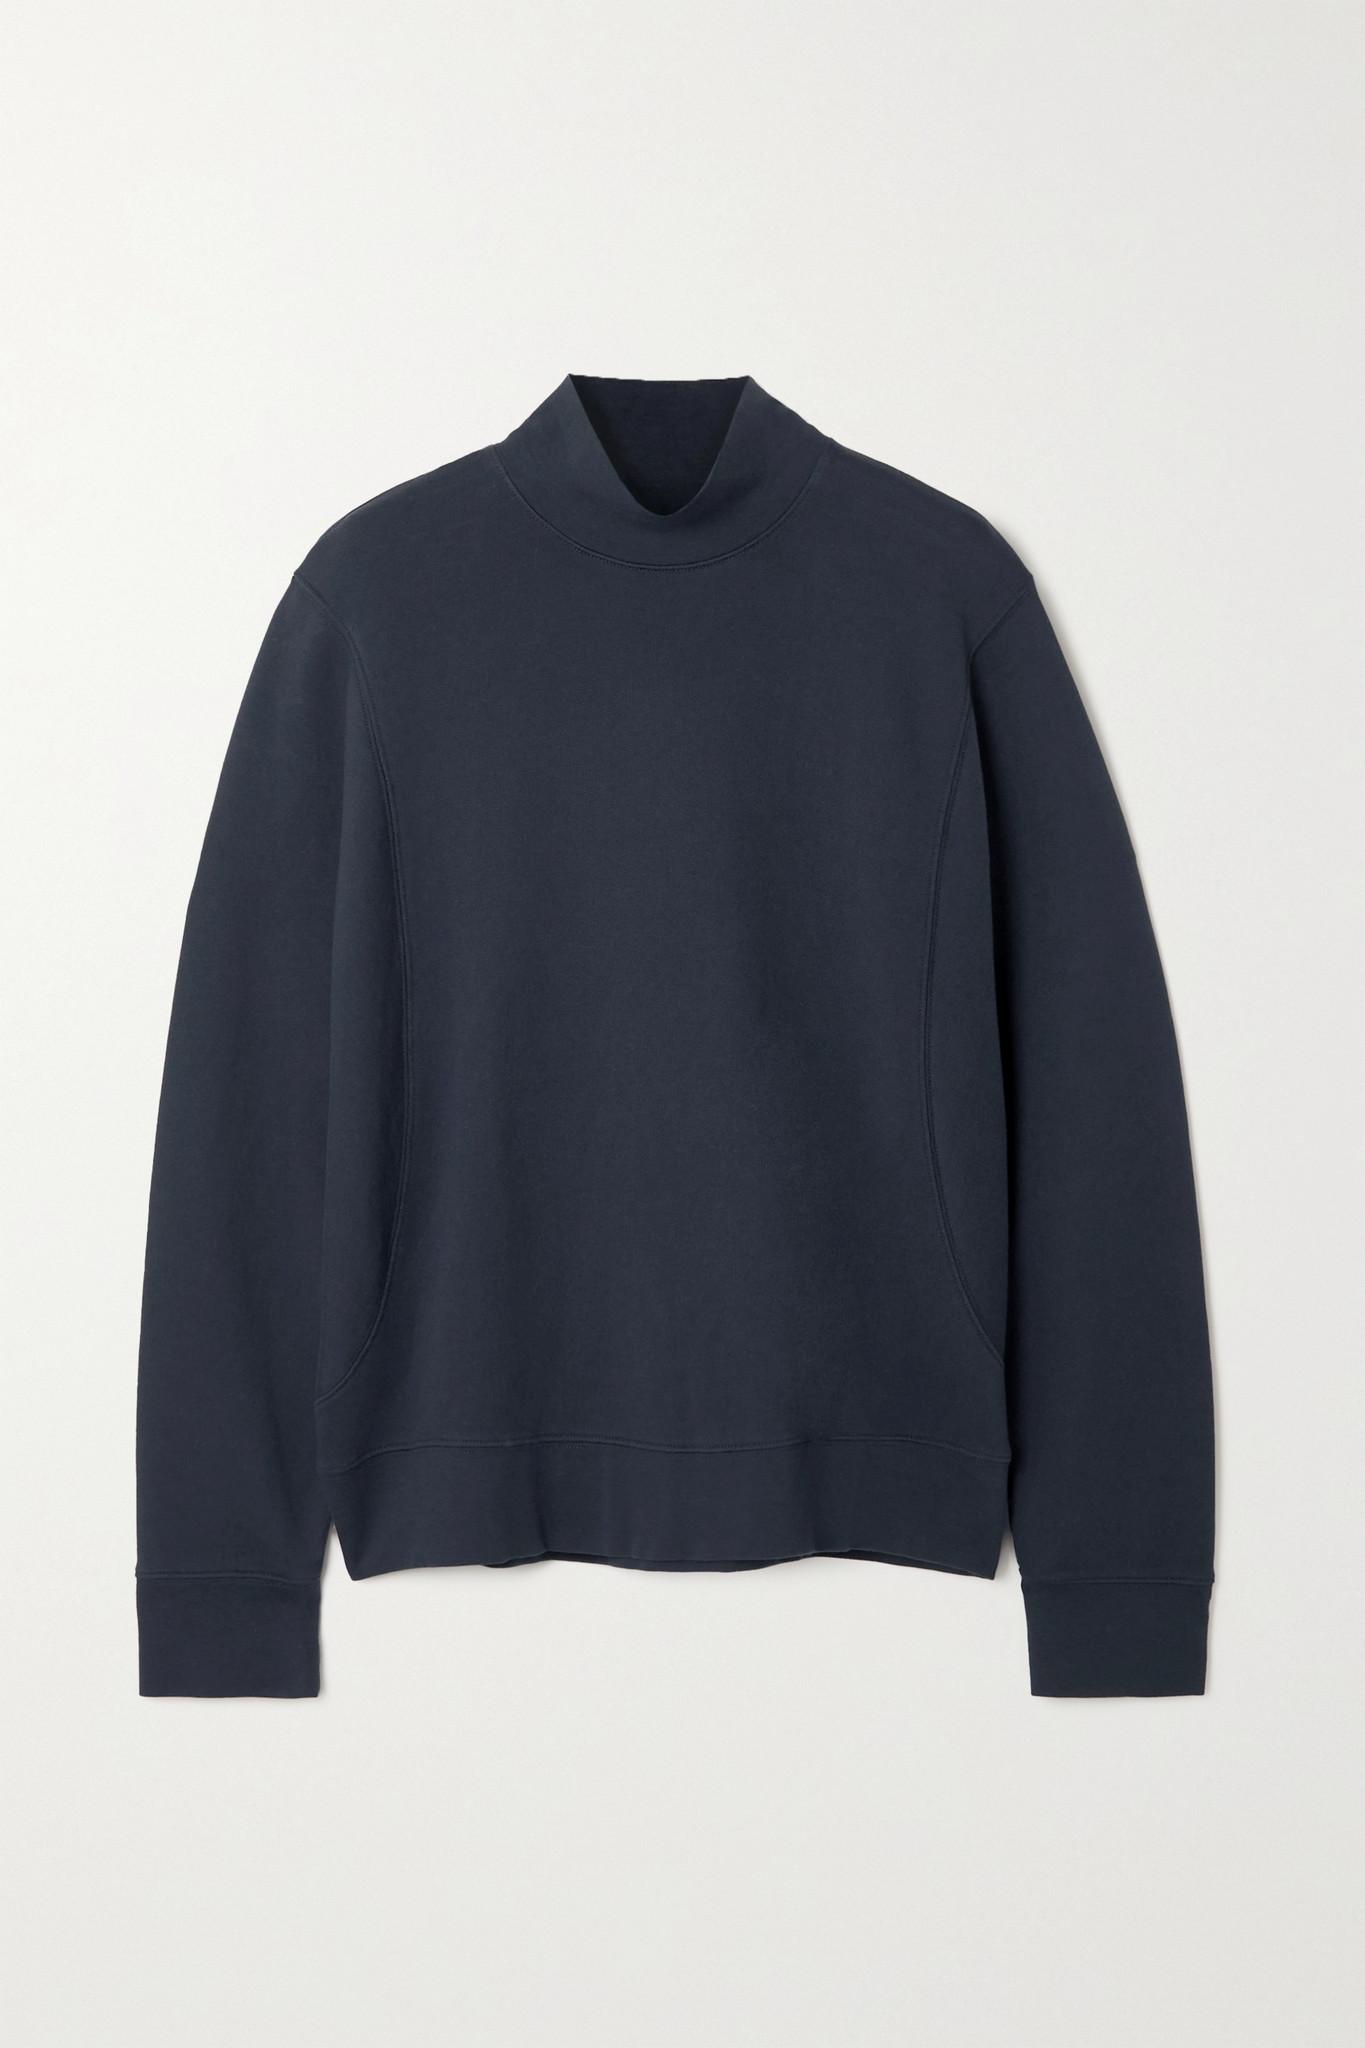 VINCE - Cotton-jersey Sweatshirt - Gray - medium